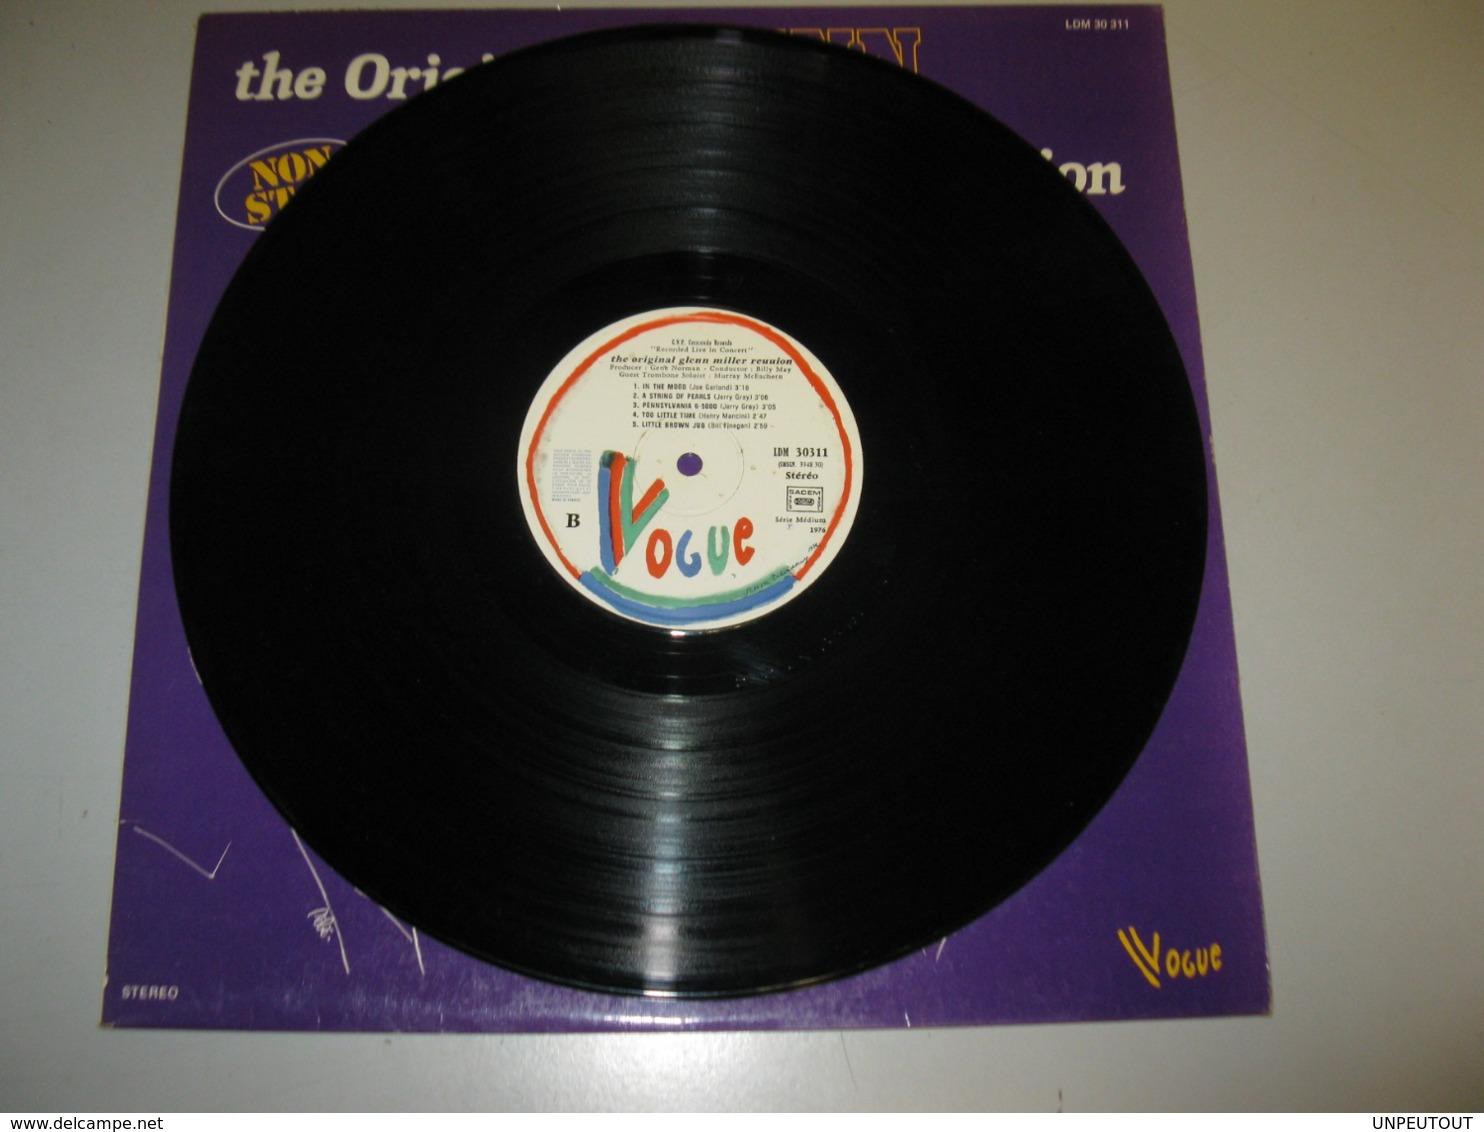 "VINYLE ""THE ORIGINAL GLENN MILLER REUNION"" 33 T VOGUE (1976) - Jazz"